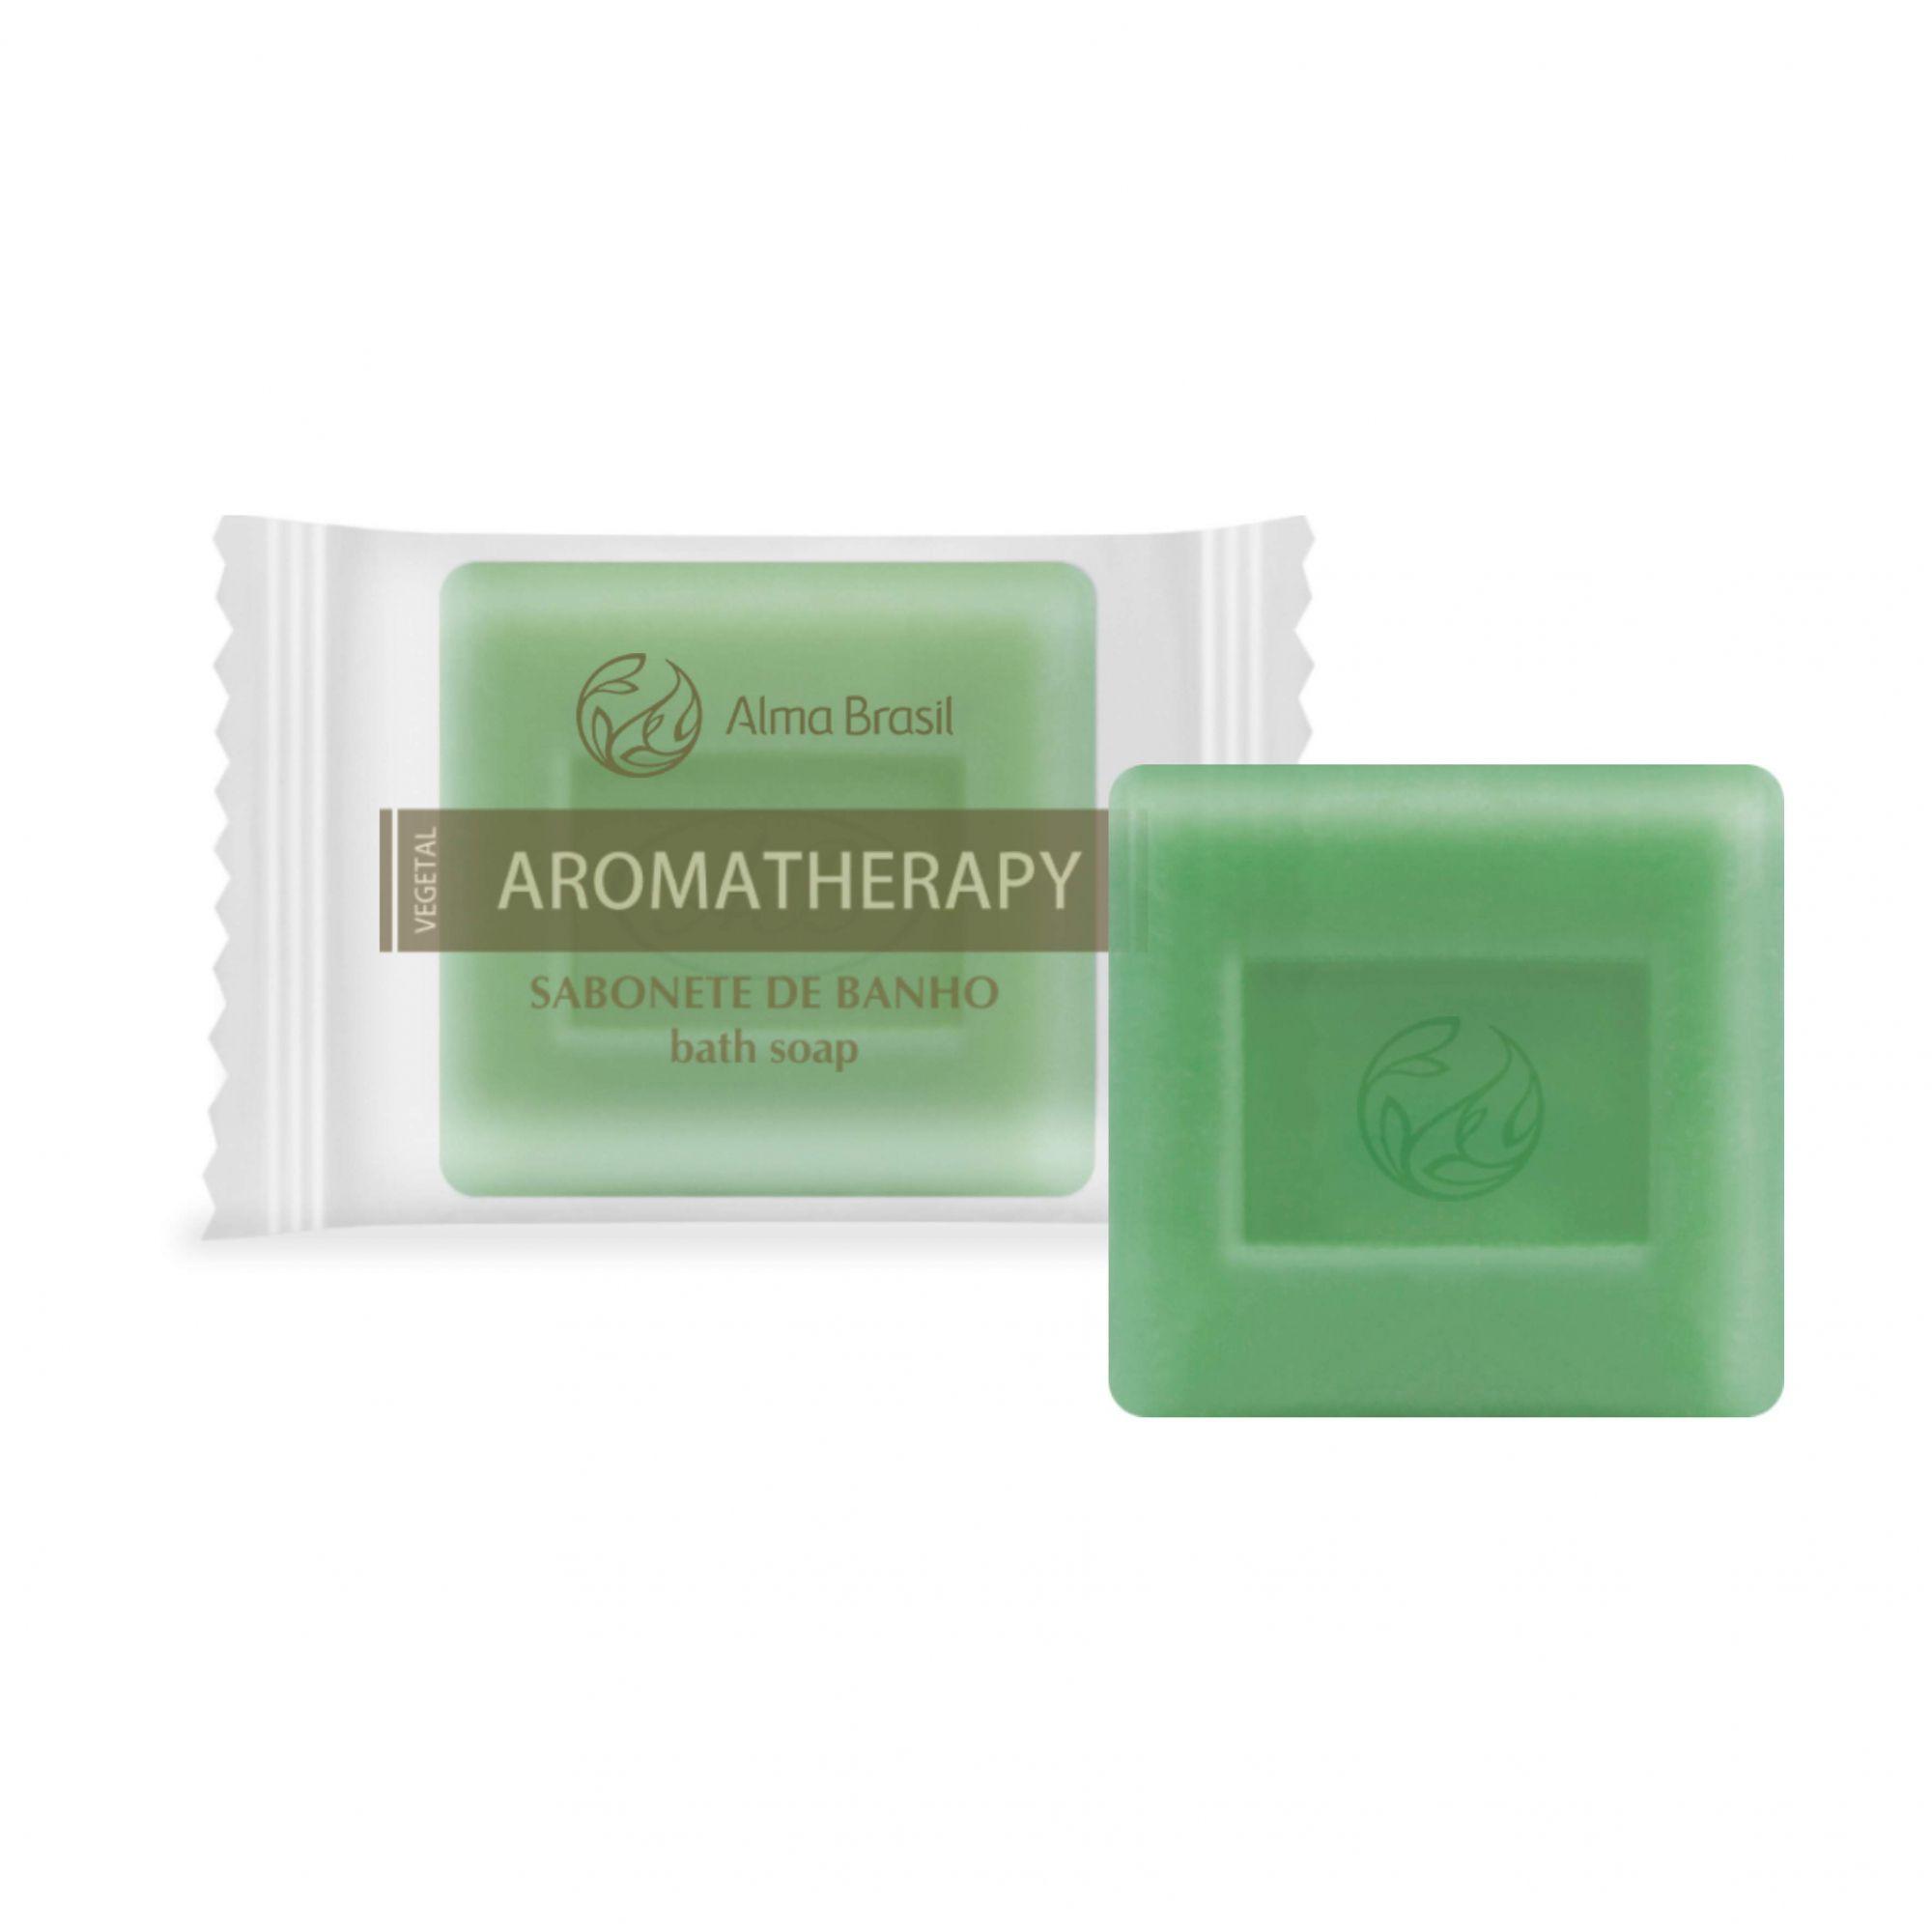 Sabonete 100% vegetal Aromatherapy 80g  - Alma Brasil Cosméticos